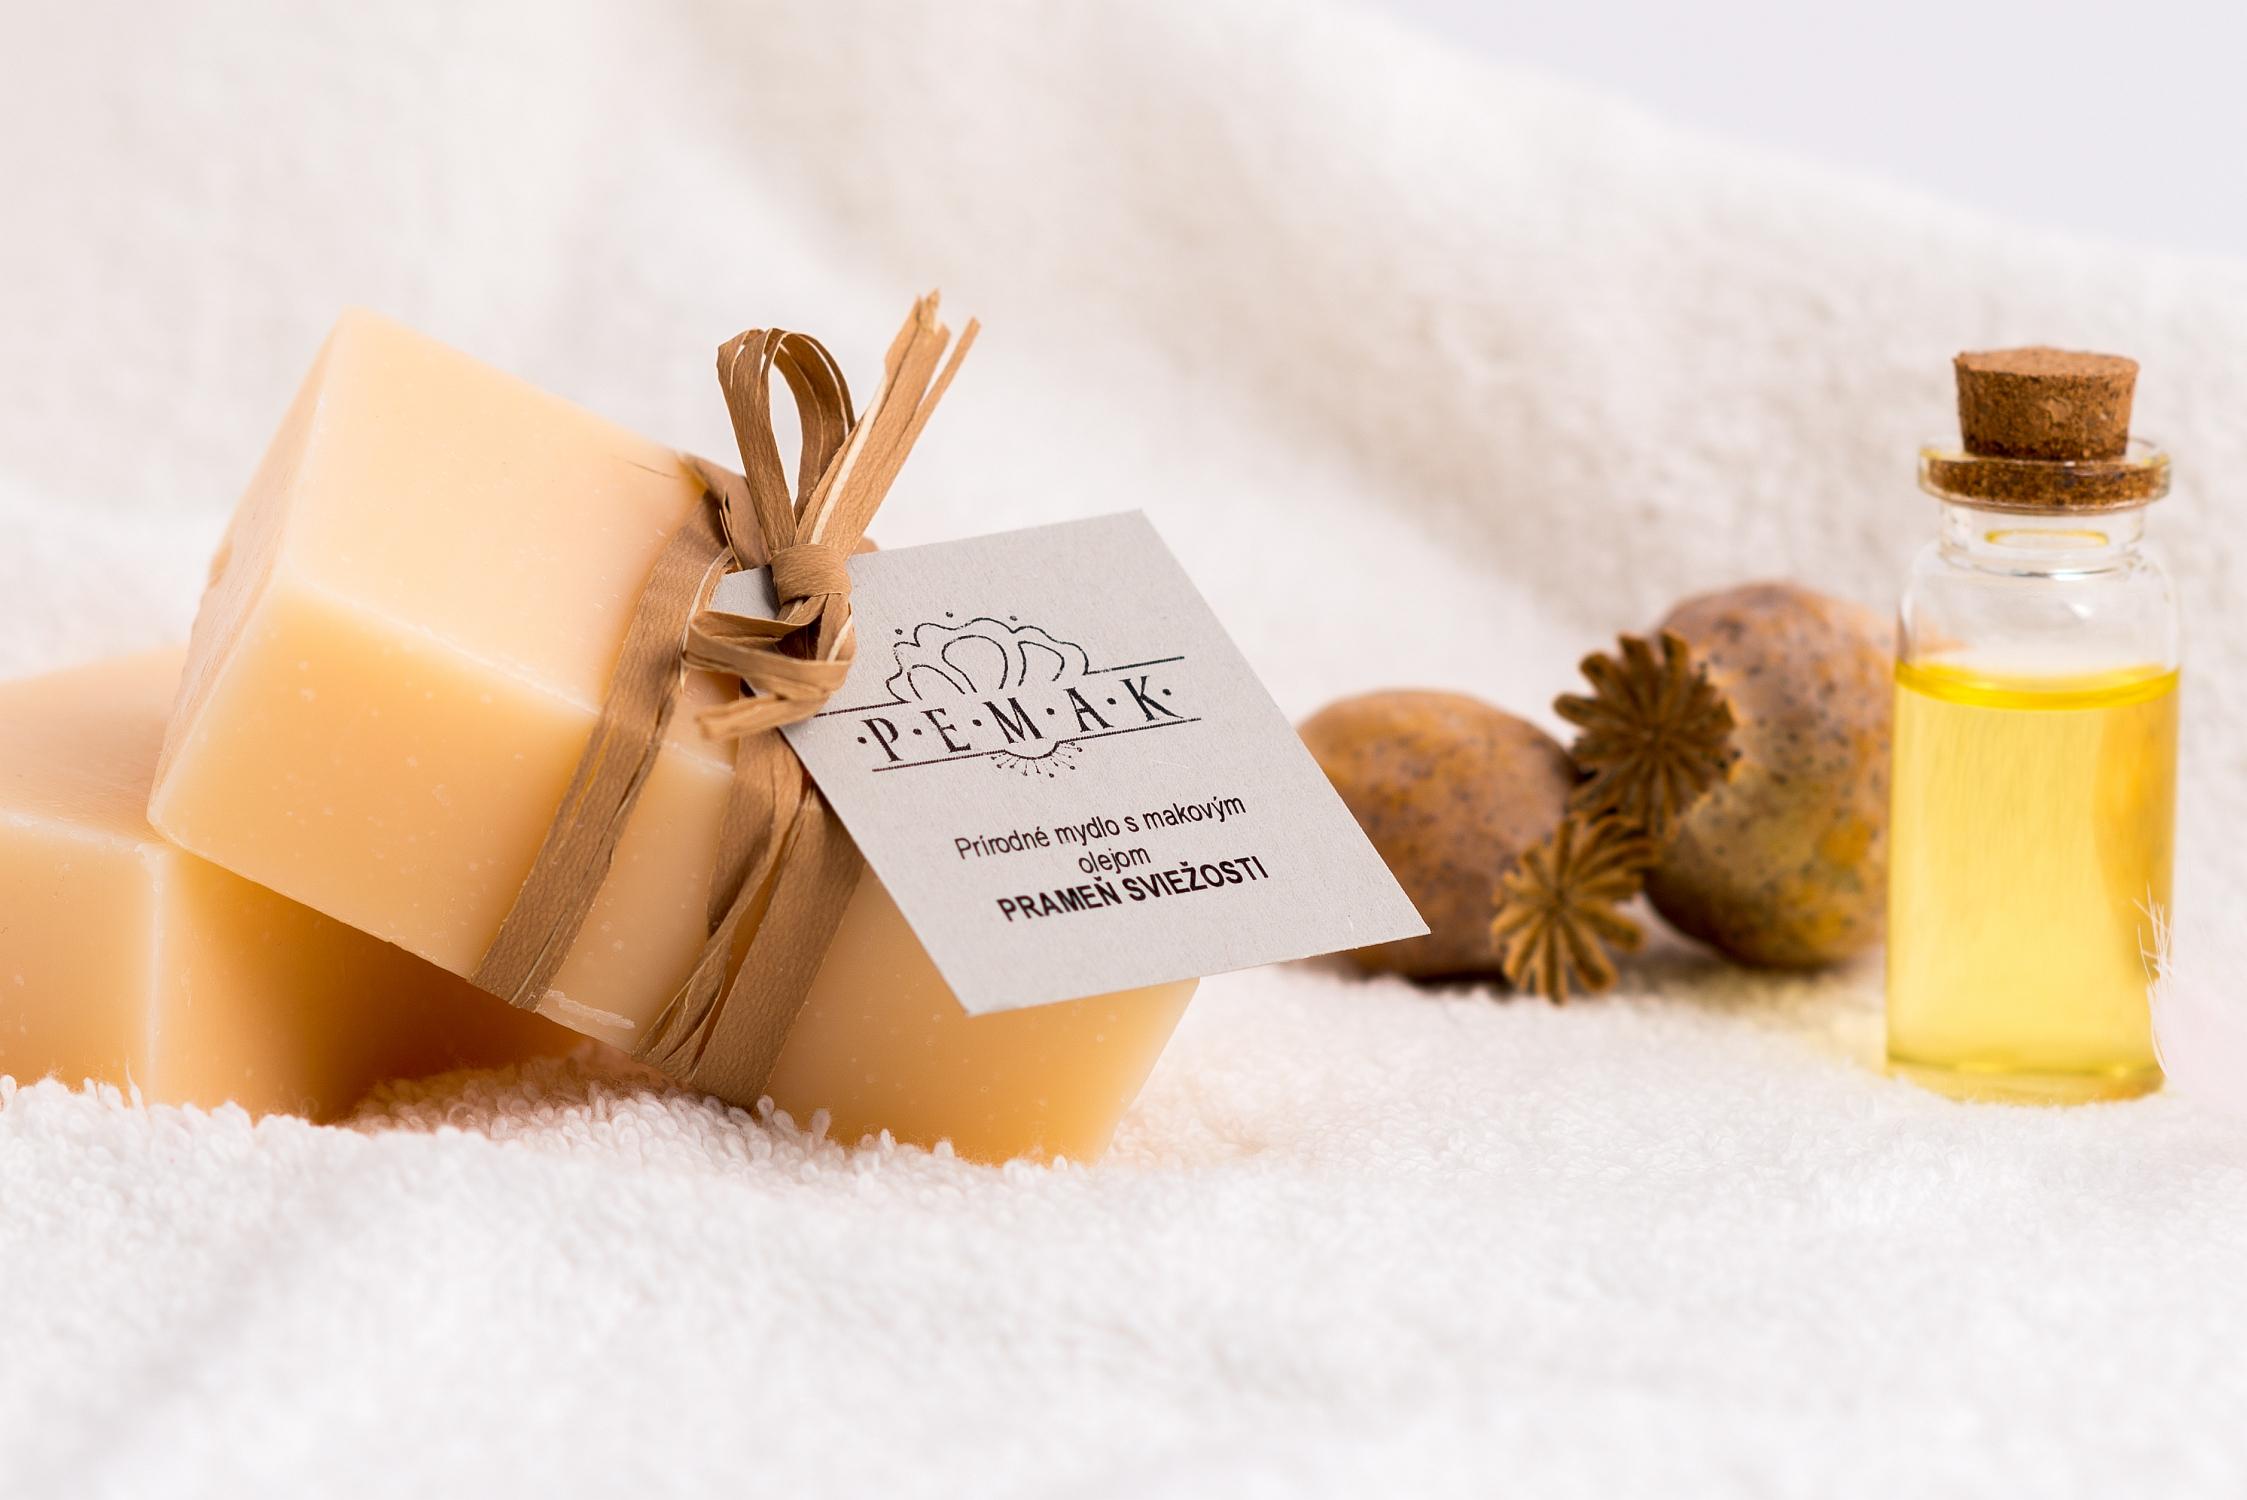 pemak soap and oil